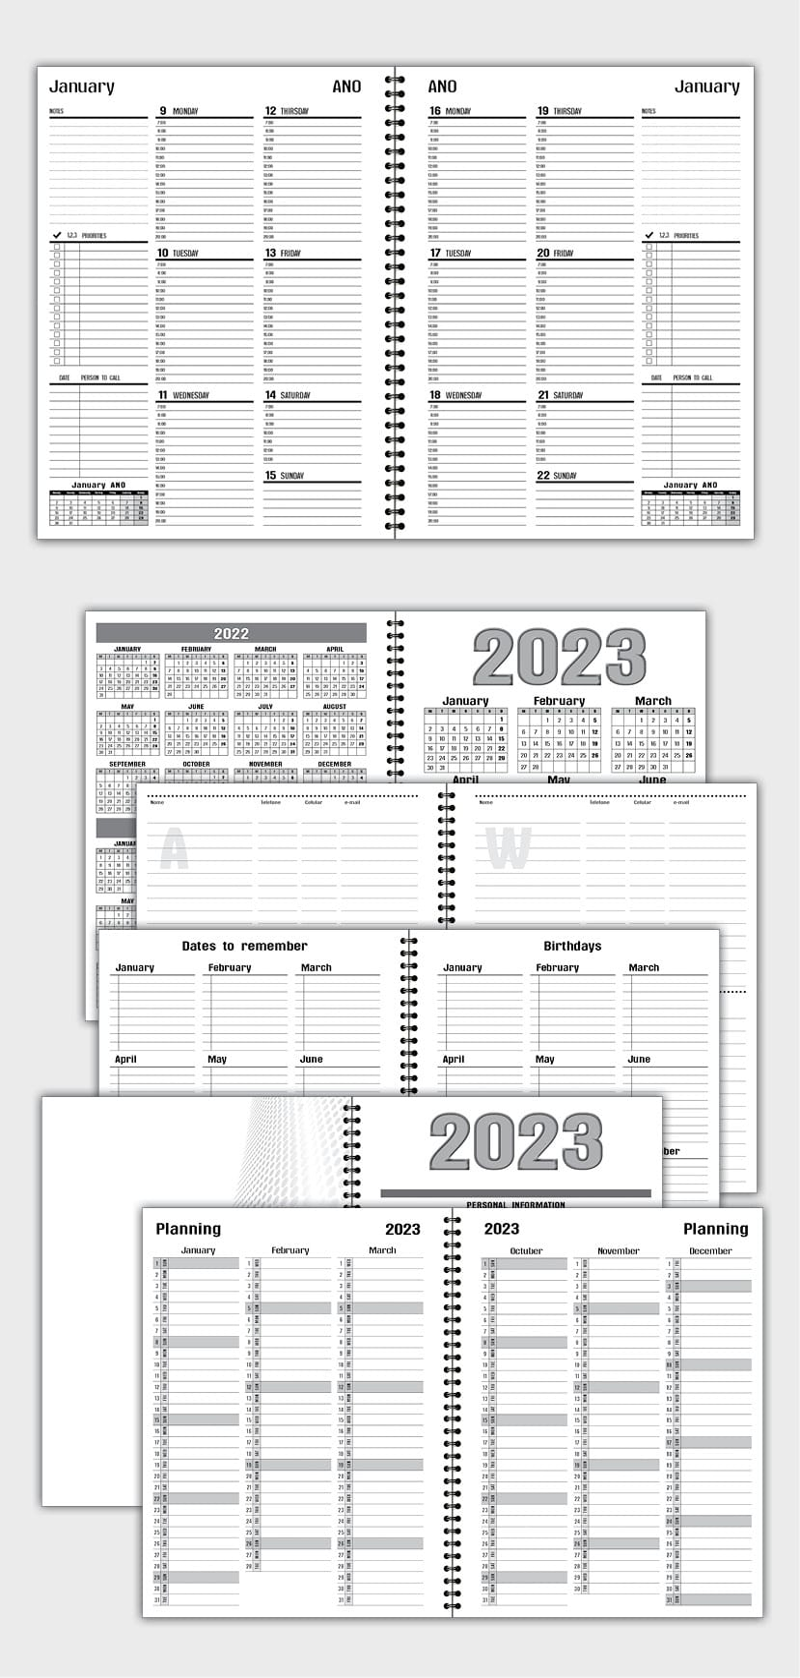 2022 DAILY PLANNER AGENDA TEMPLATE MODEL ATD38